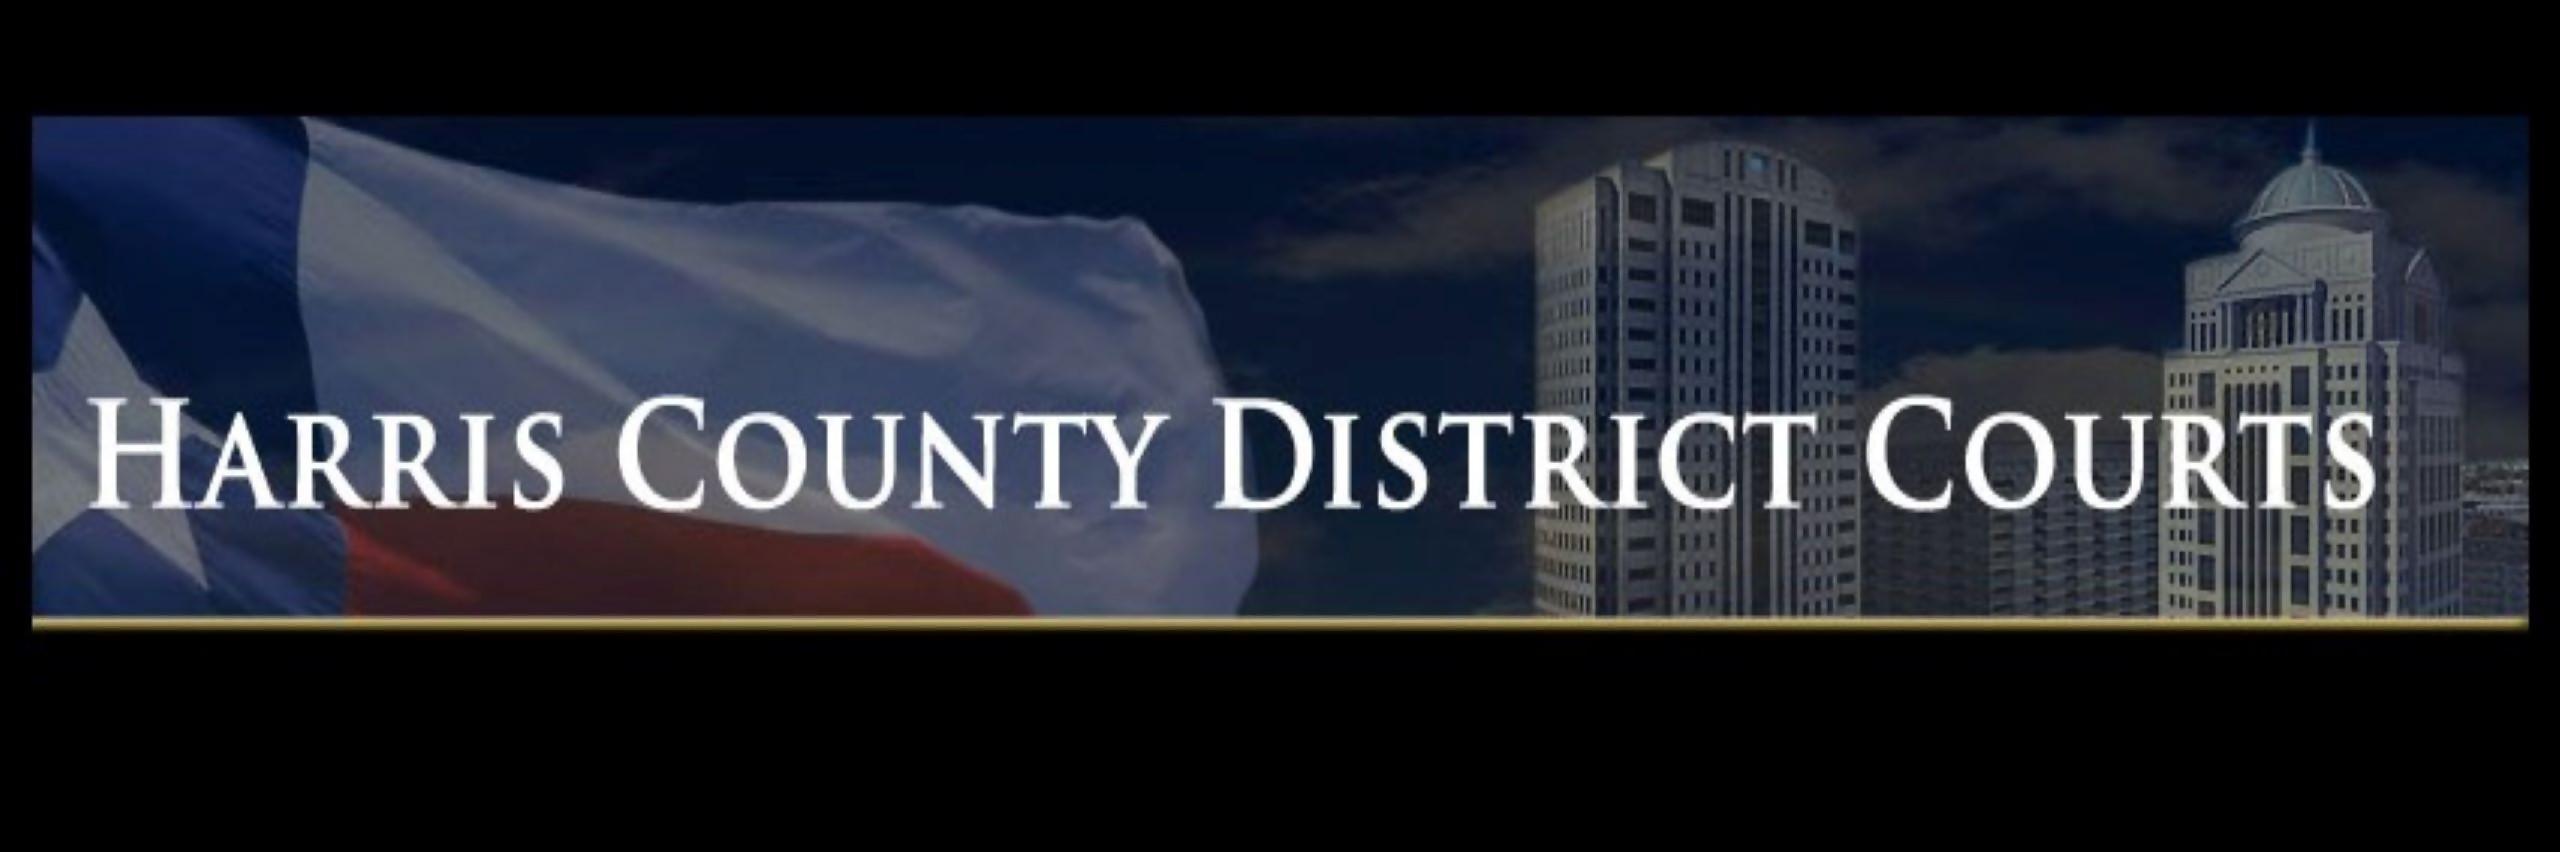 11th District Court - Live Stream